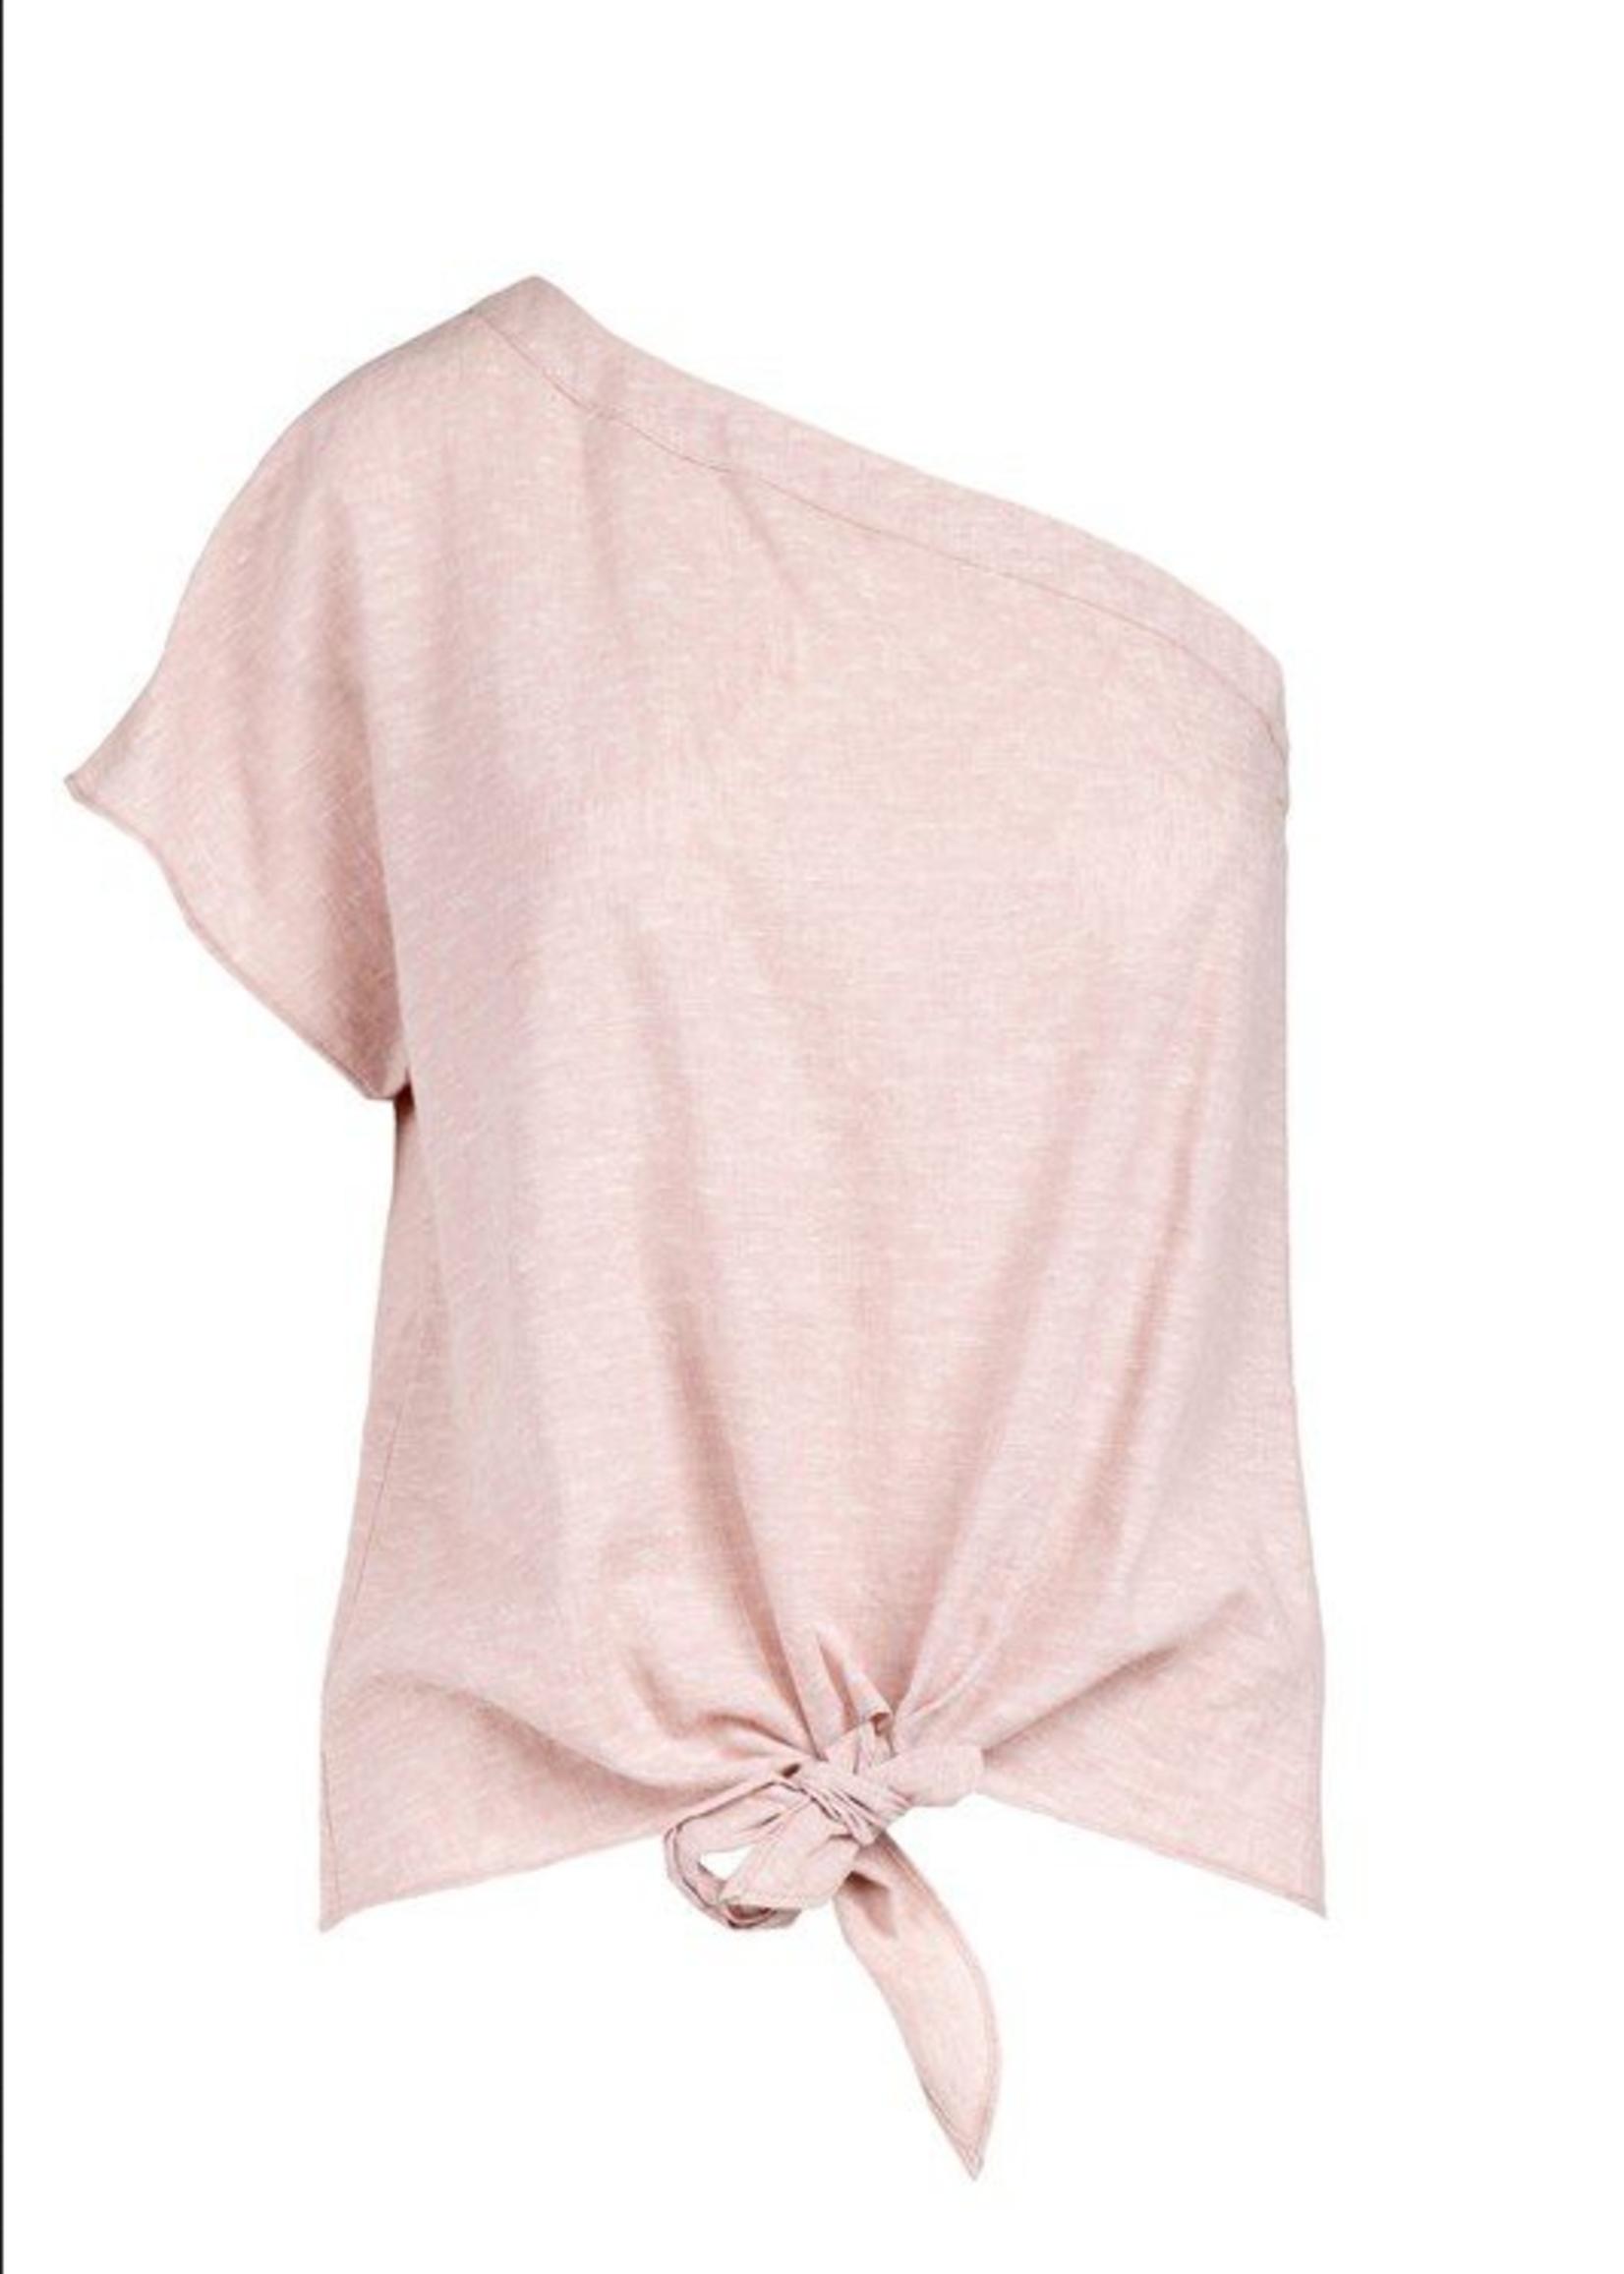 One Shoulder Top with Tie - Mauve